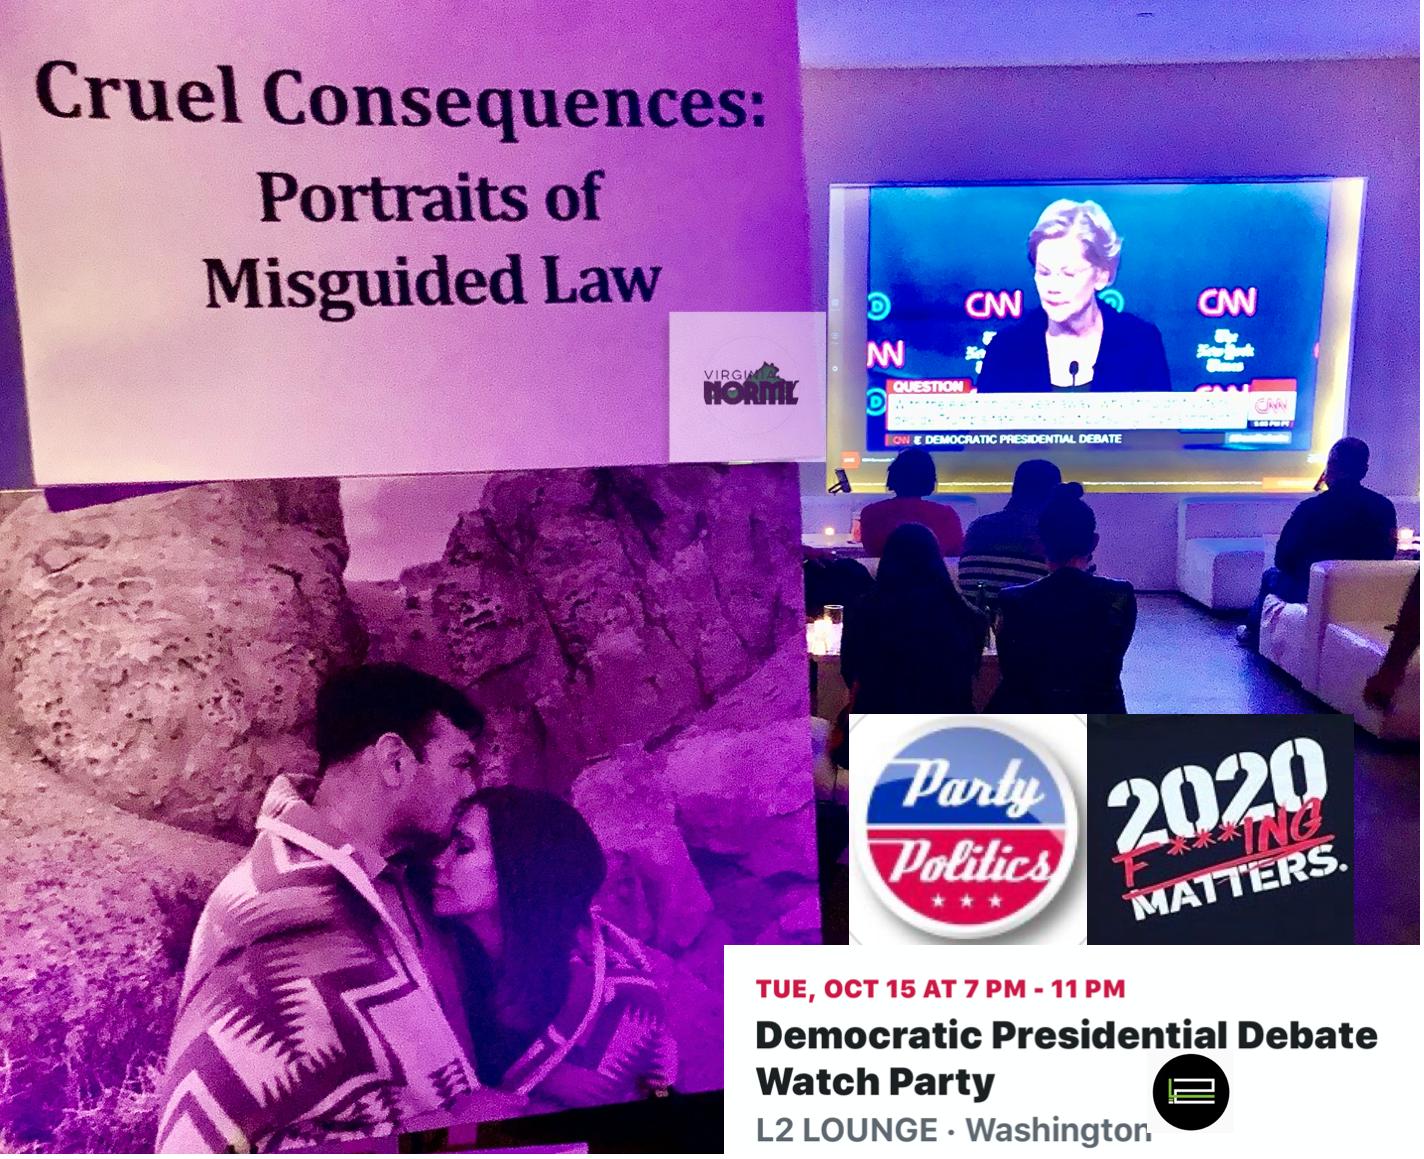 Party Politics Debate Watch Party in D.C.